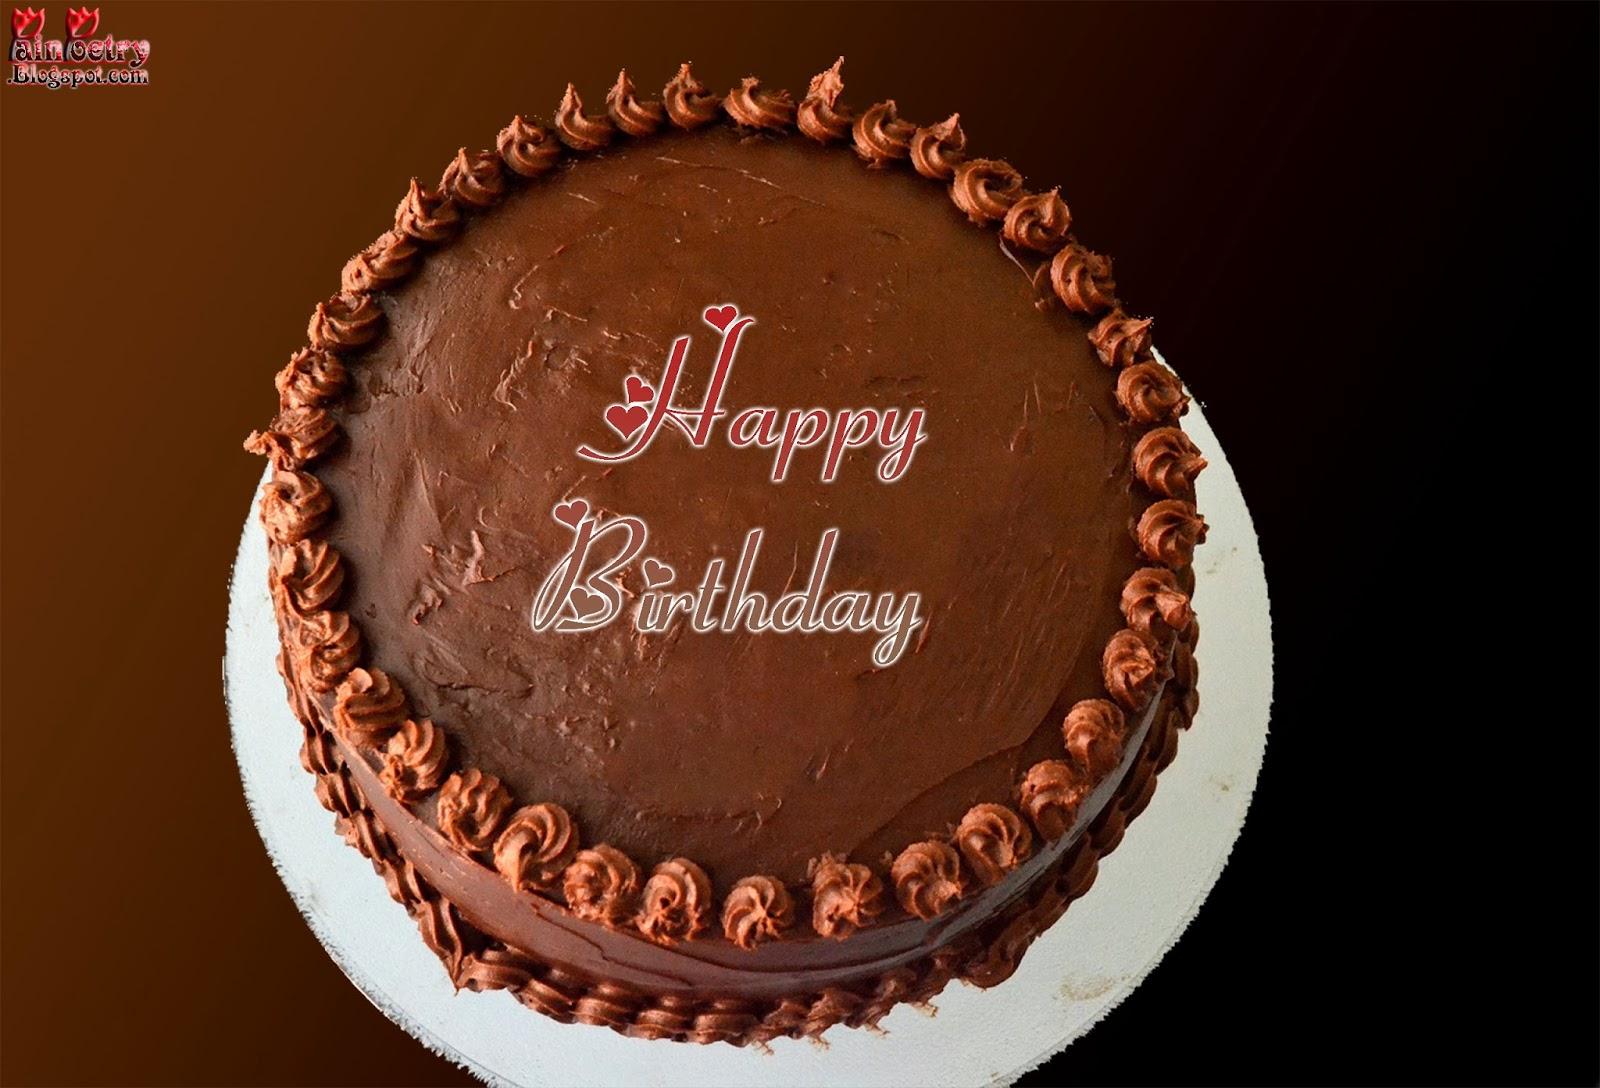 Happy-Birthday-Cake-Wishes-Chocolate-Walpaper-Image-HD-Wide